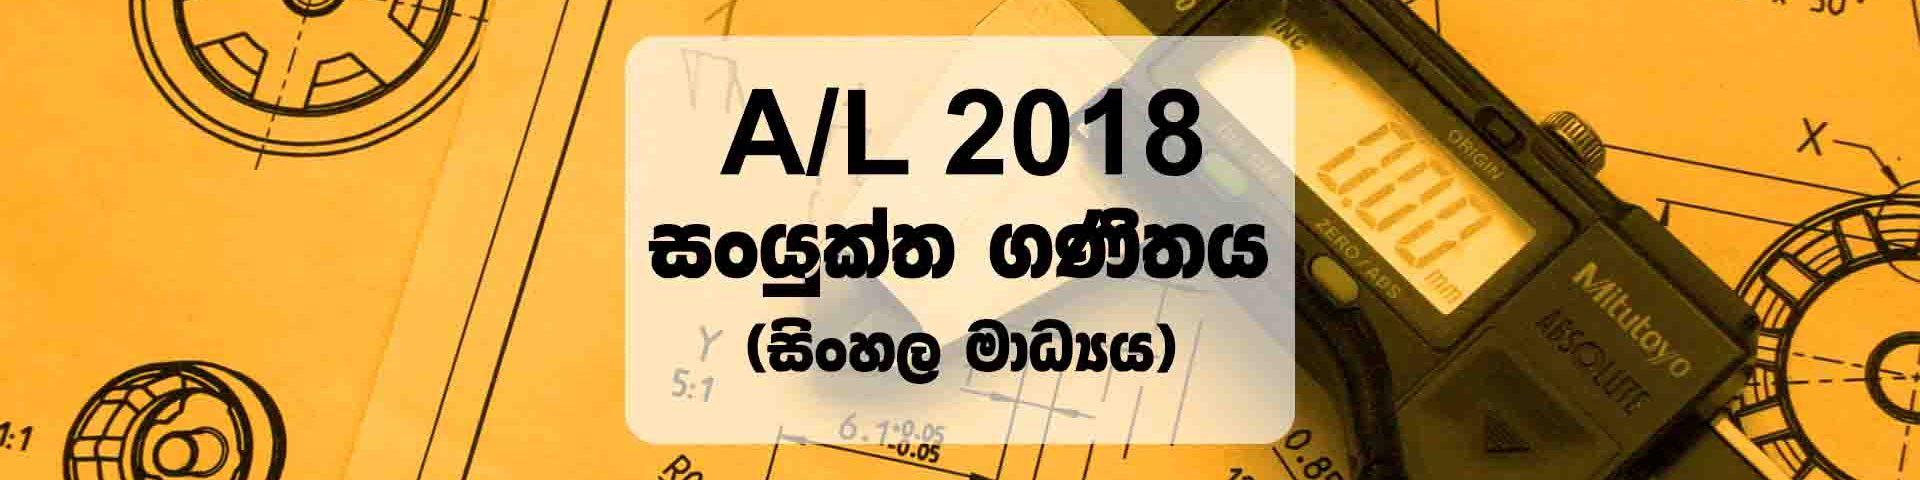 2018 A/L Combined Maths Past Paper